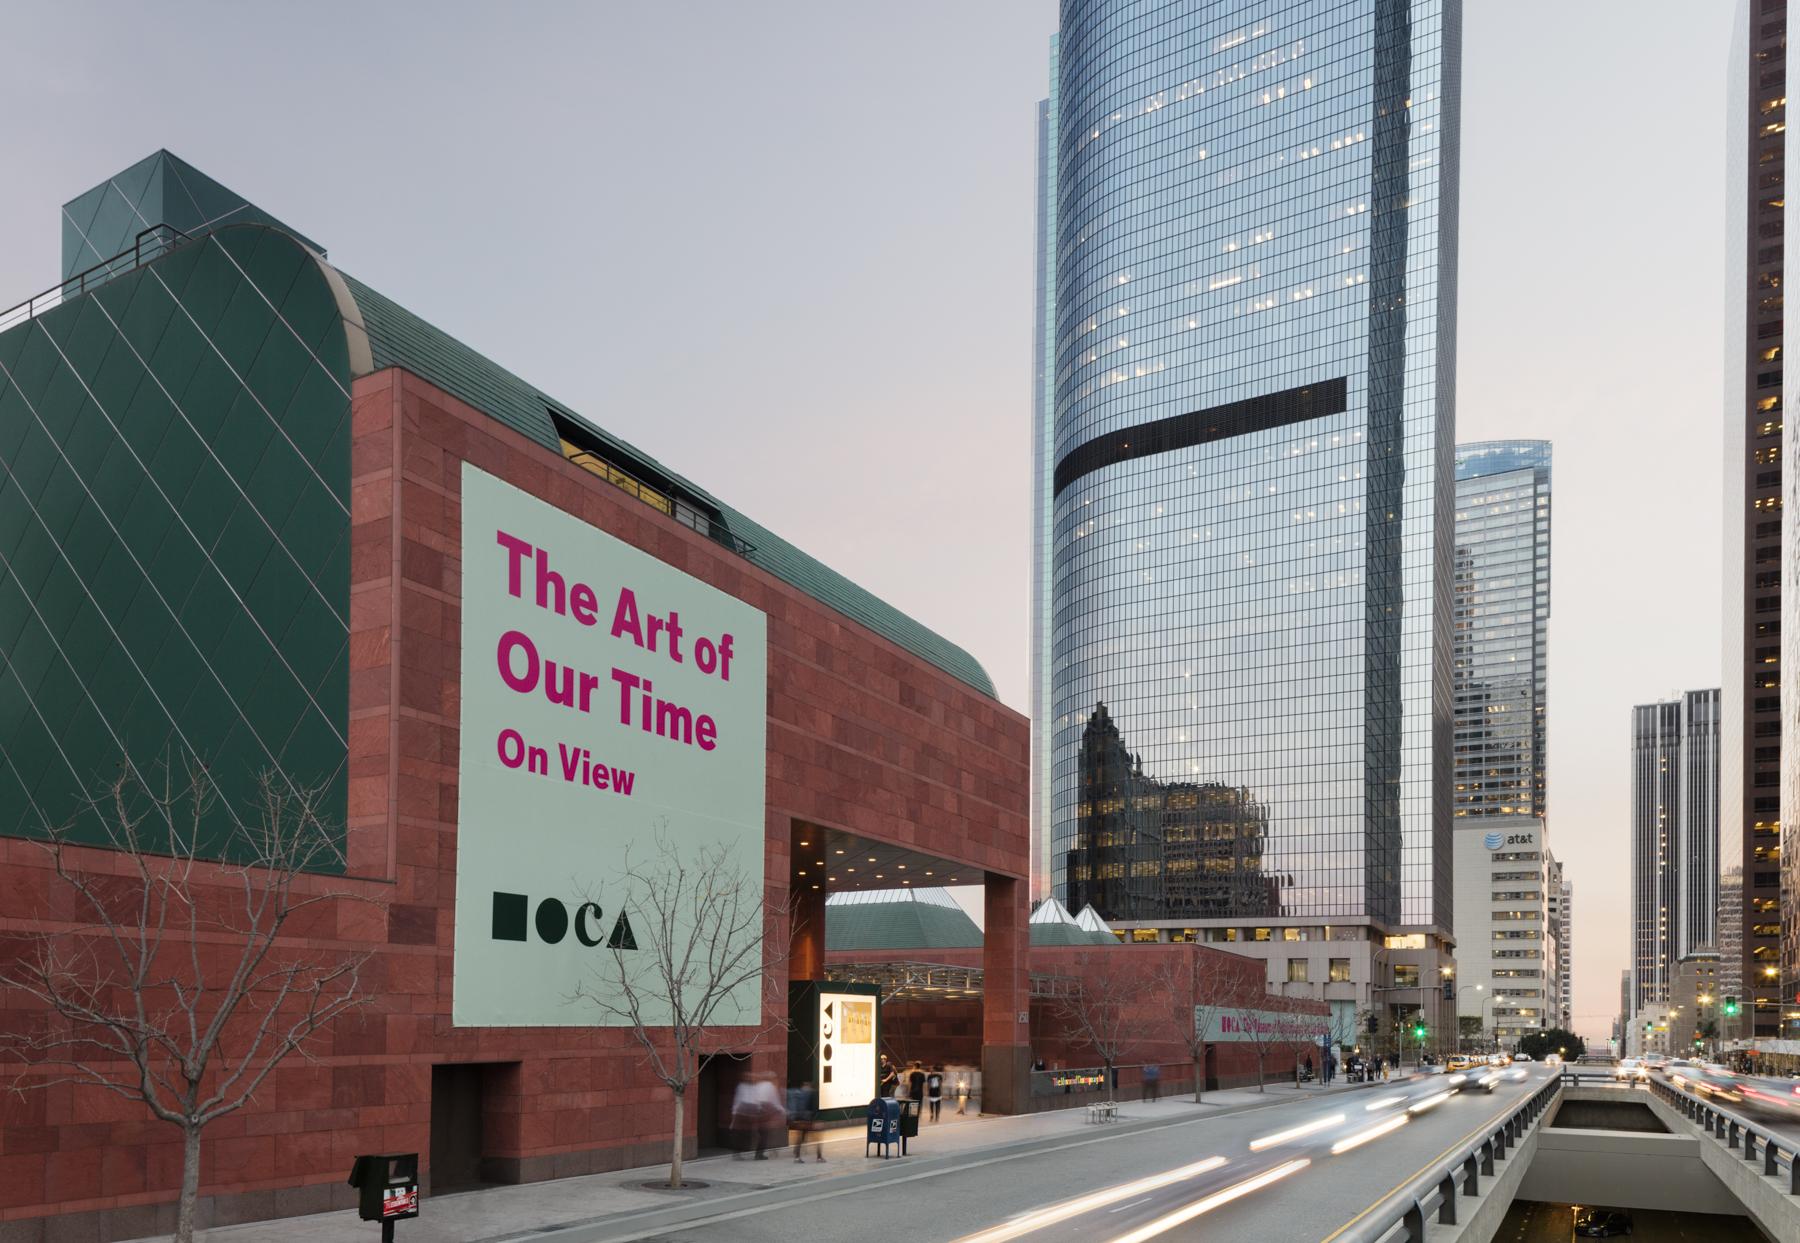 MOCA Grand Avenue, photo by Elon Schoenholz